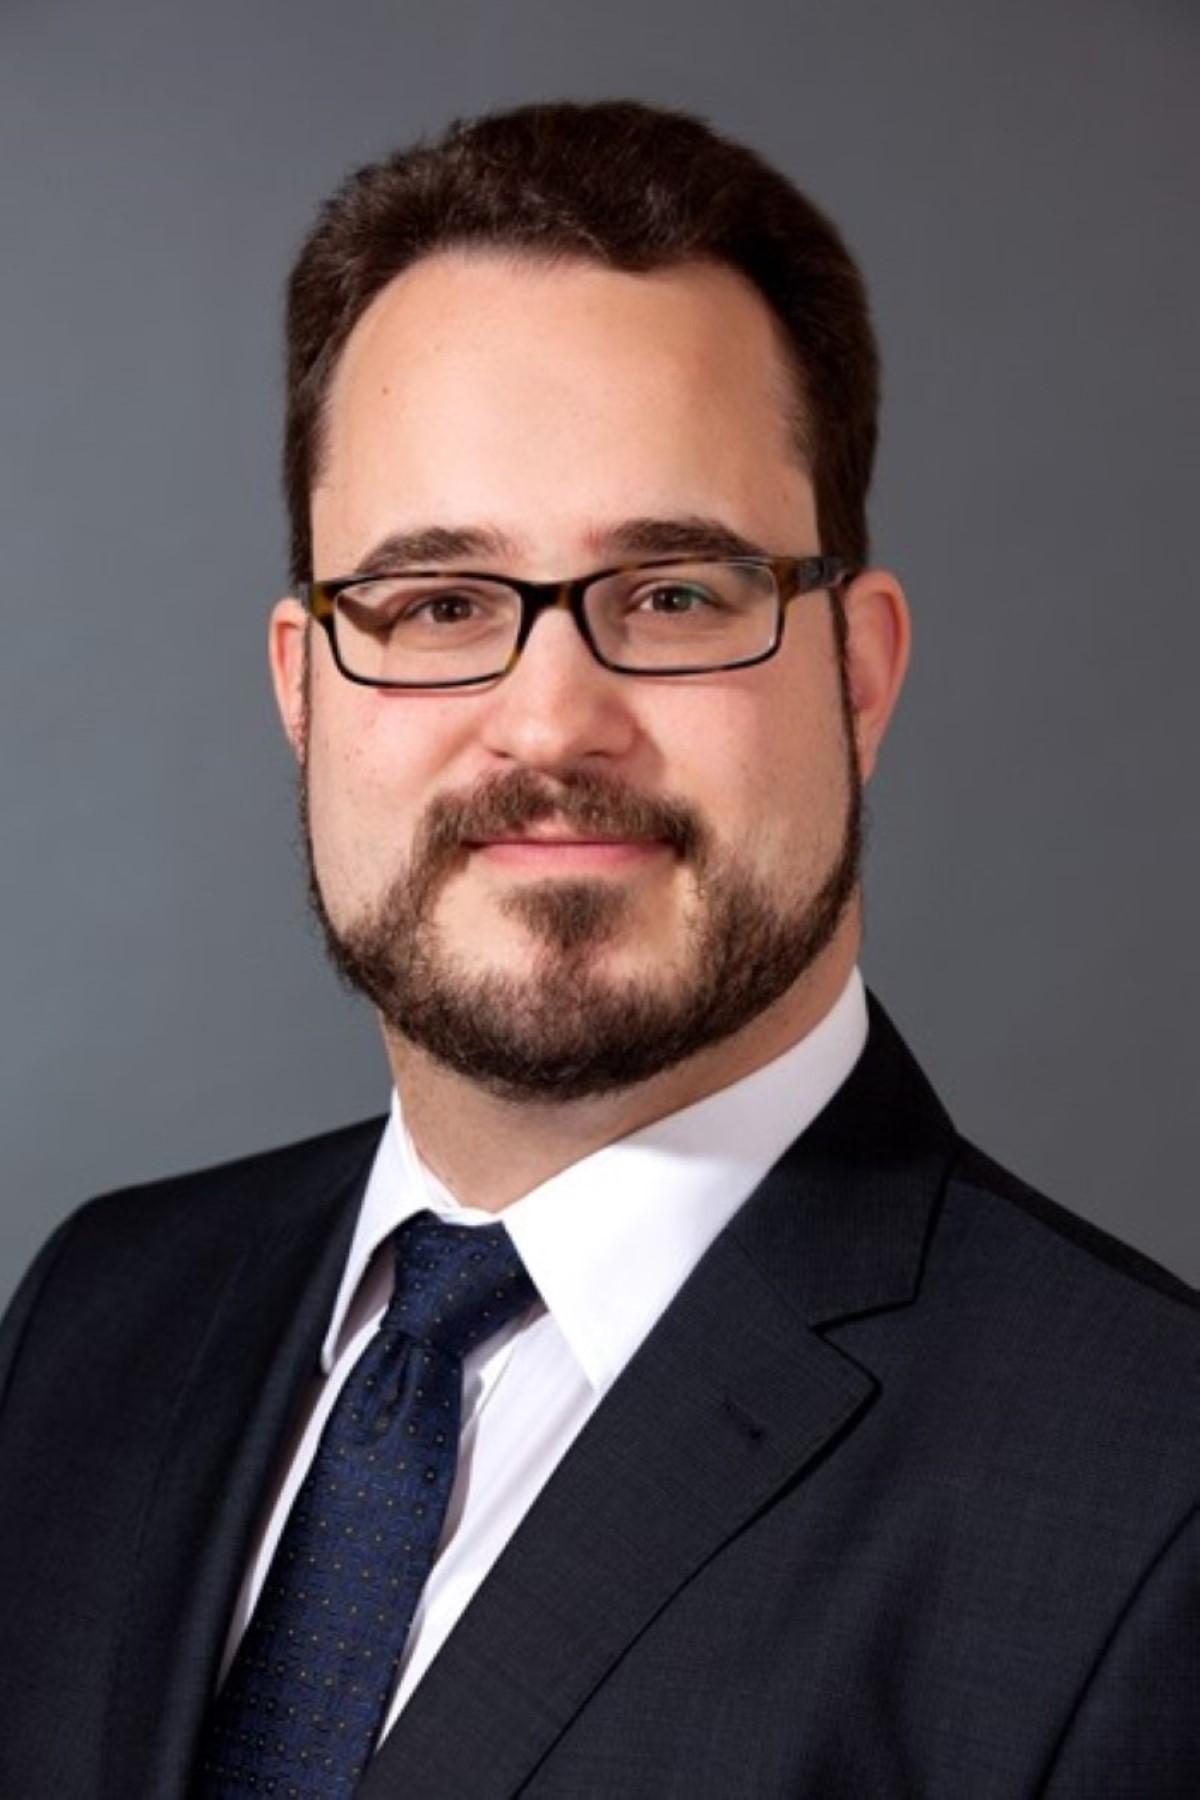 Rechtsanwaltskanzlei Péter Bognár Ügyvéd, Stuttgartban